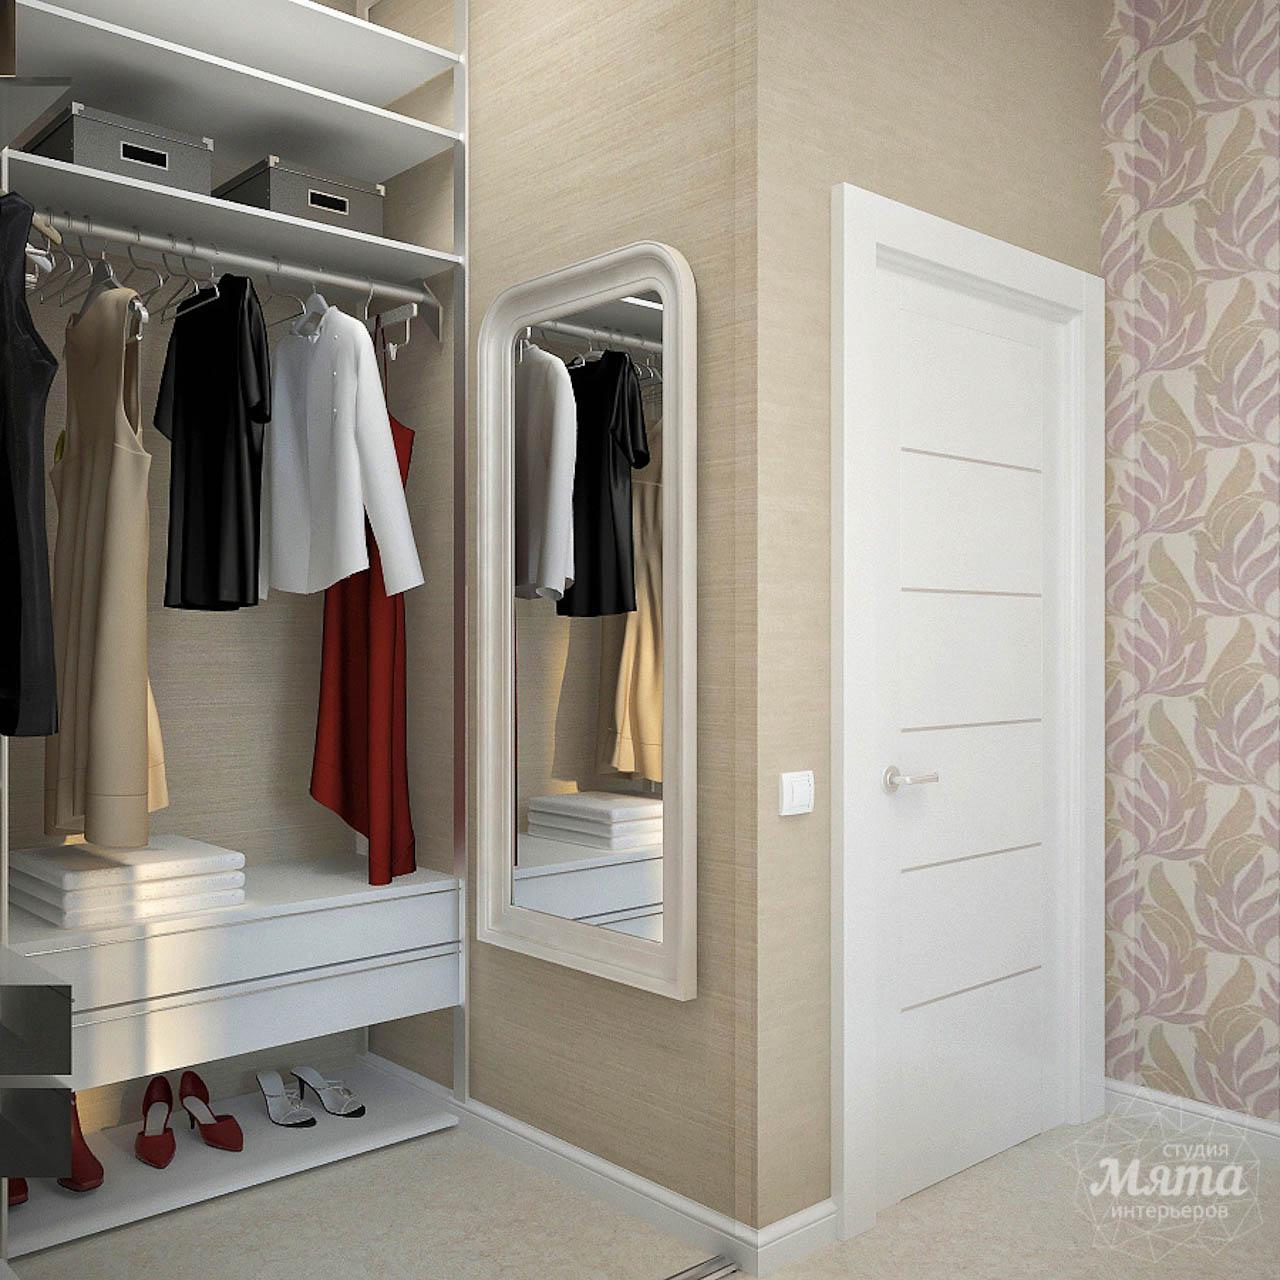 Дизайн интерьера и ремонт трехкомнатной квартиры по ул. Чкалова 124 img21018995